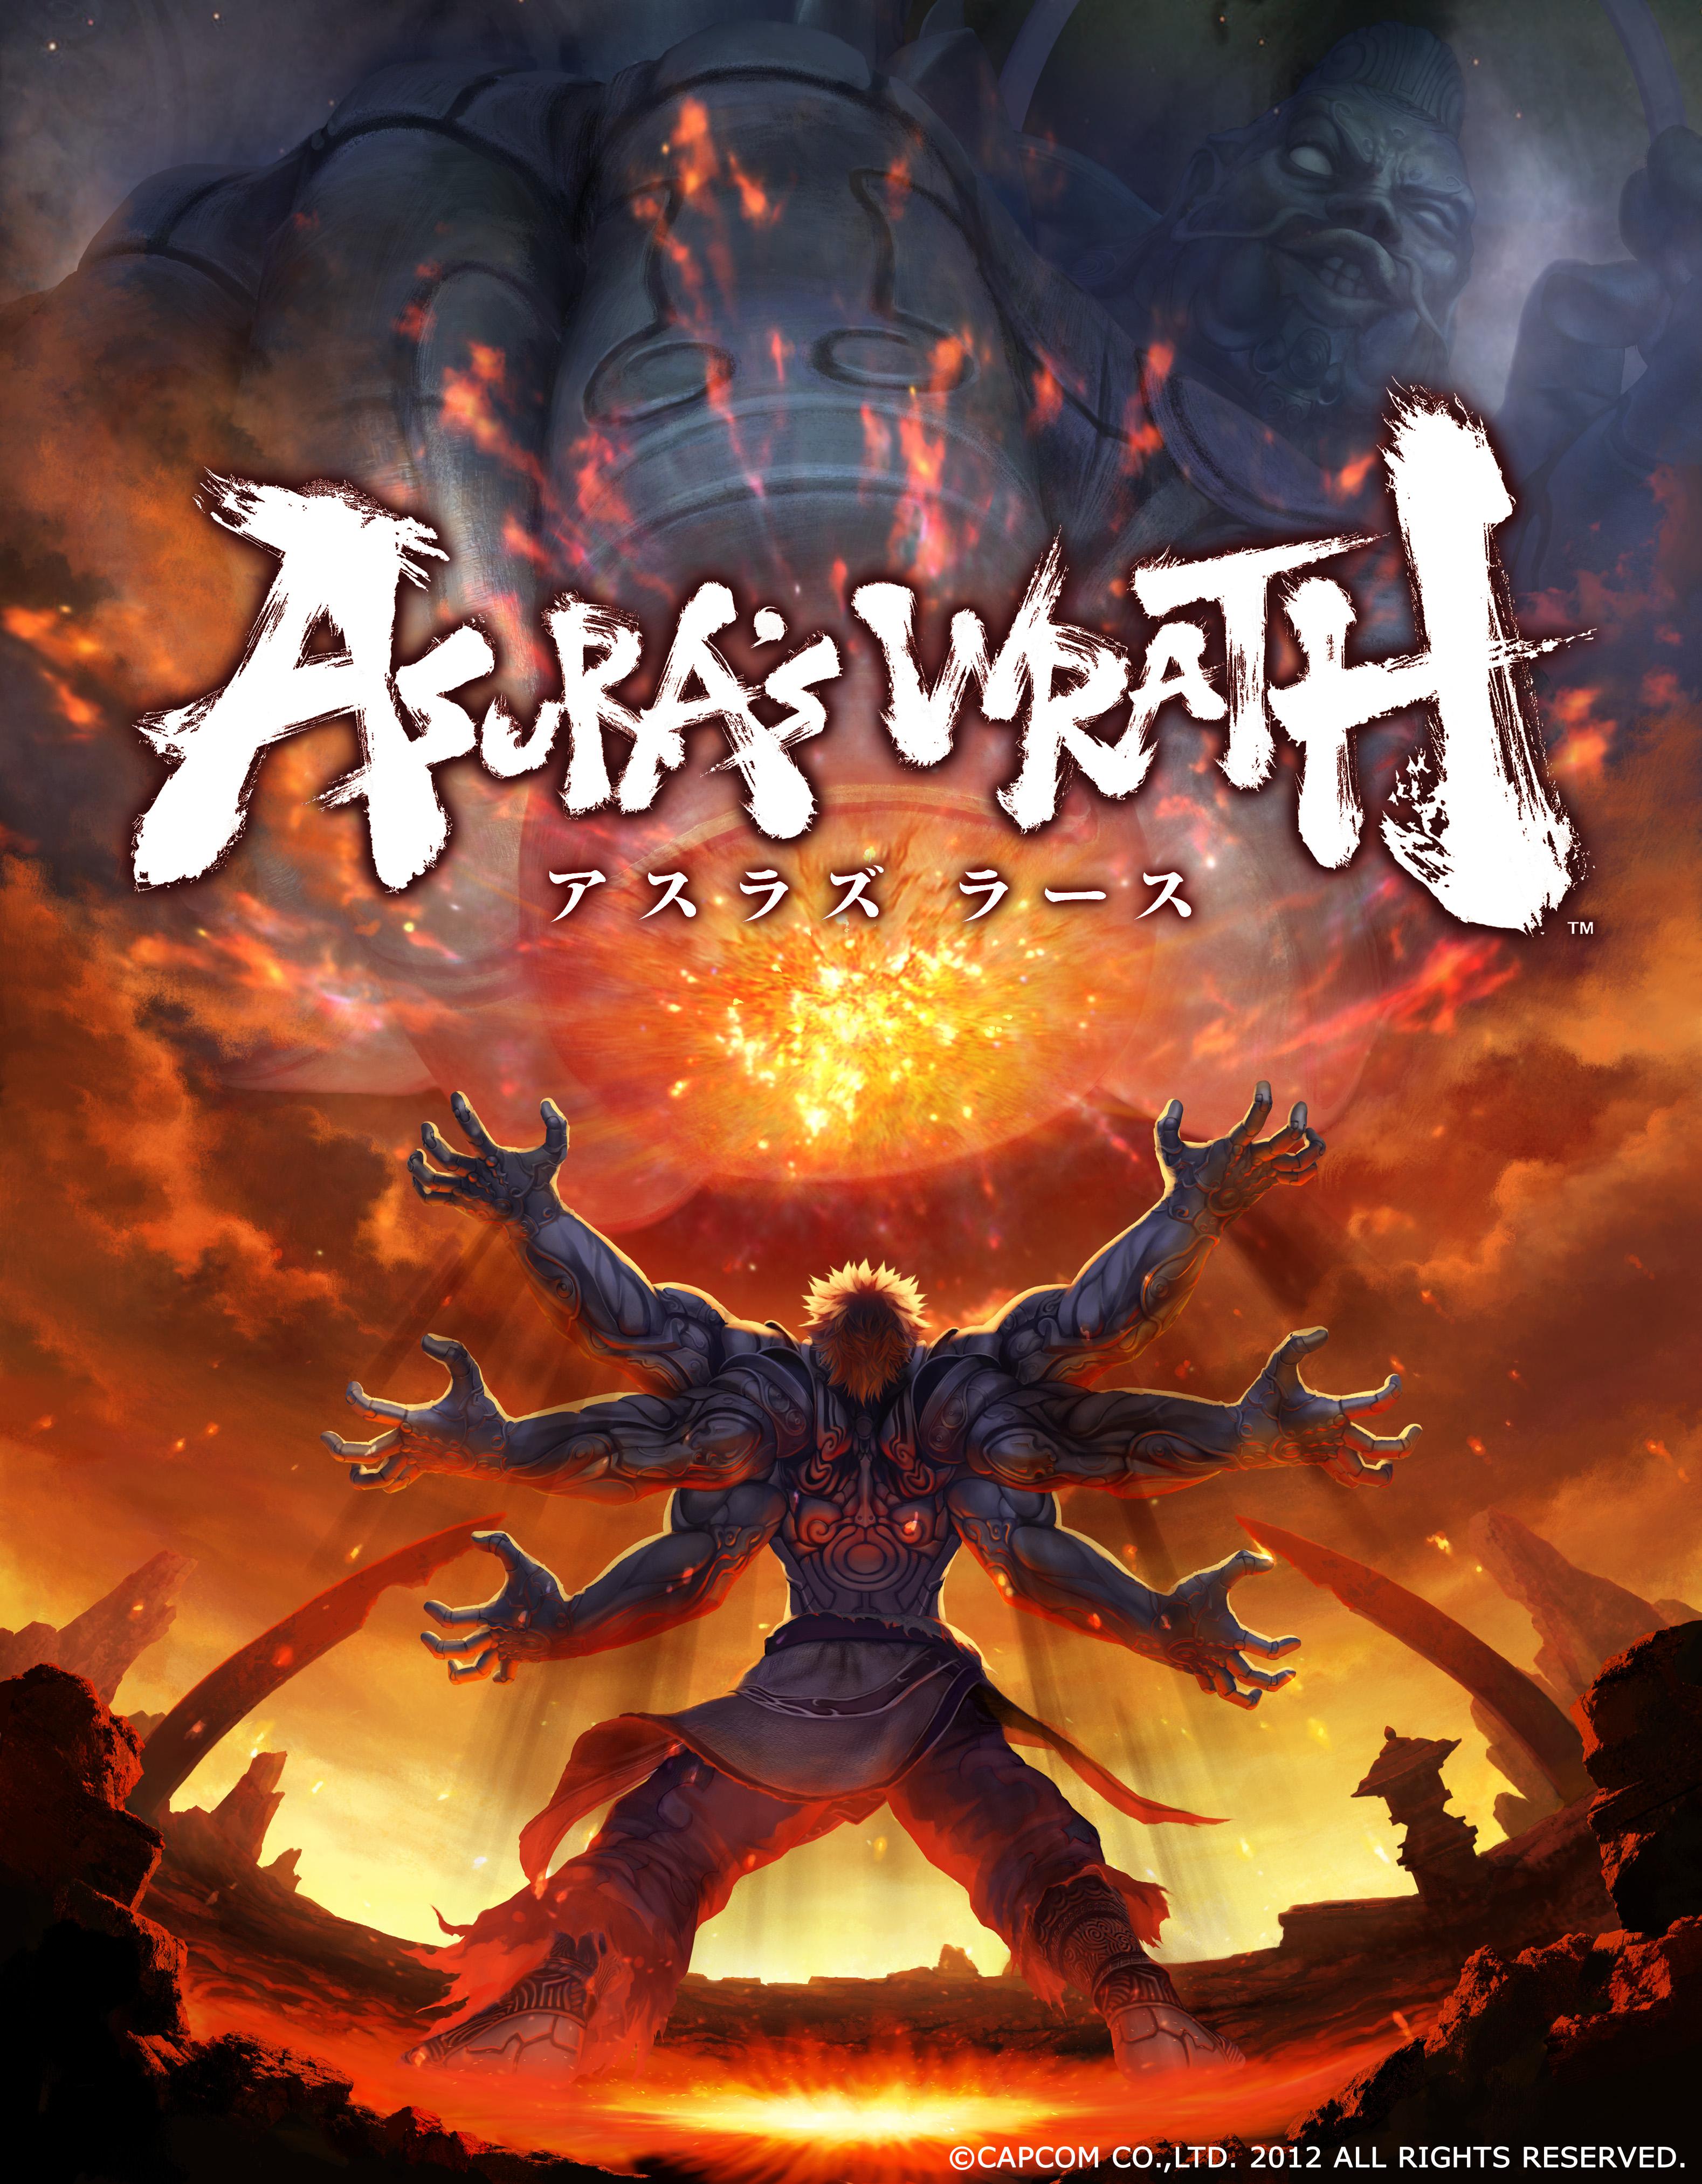 「ASURA'S WRATH」E3用アート+コピーライト